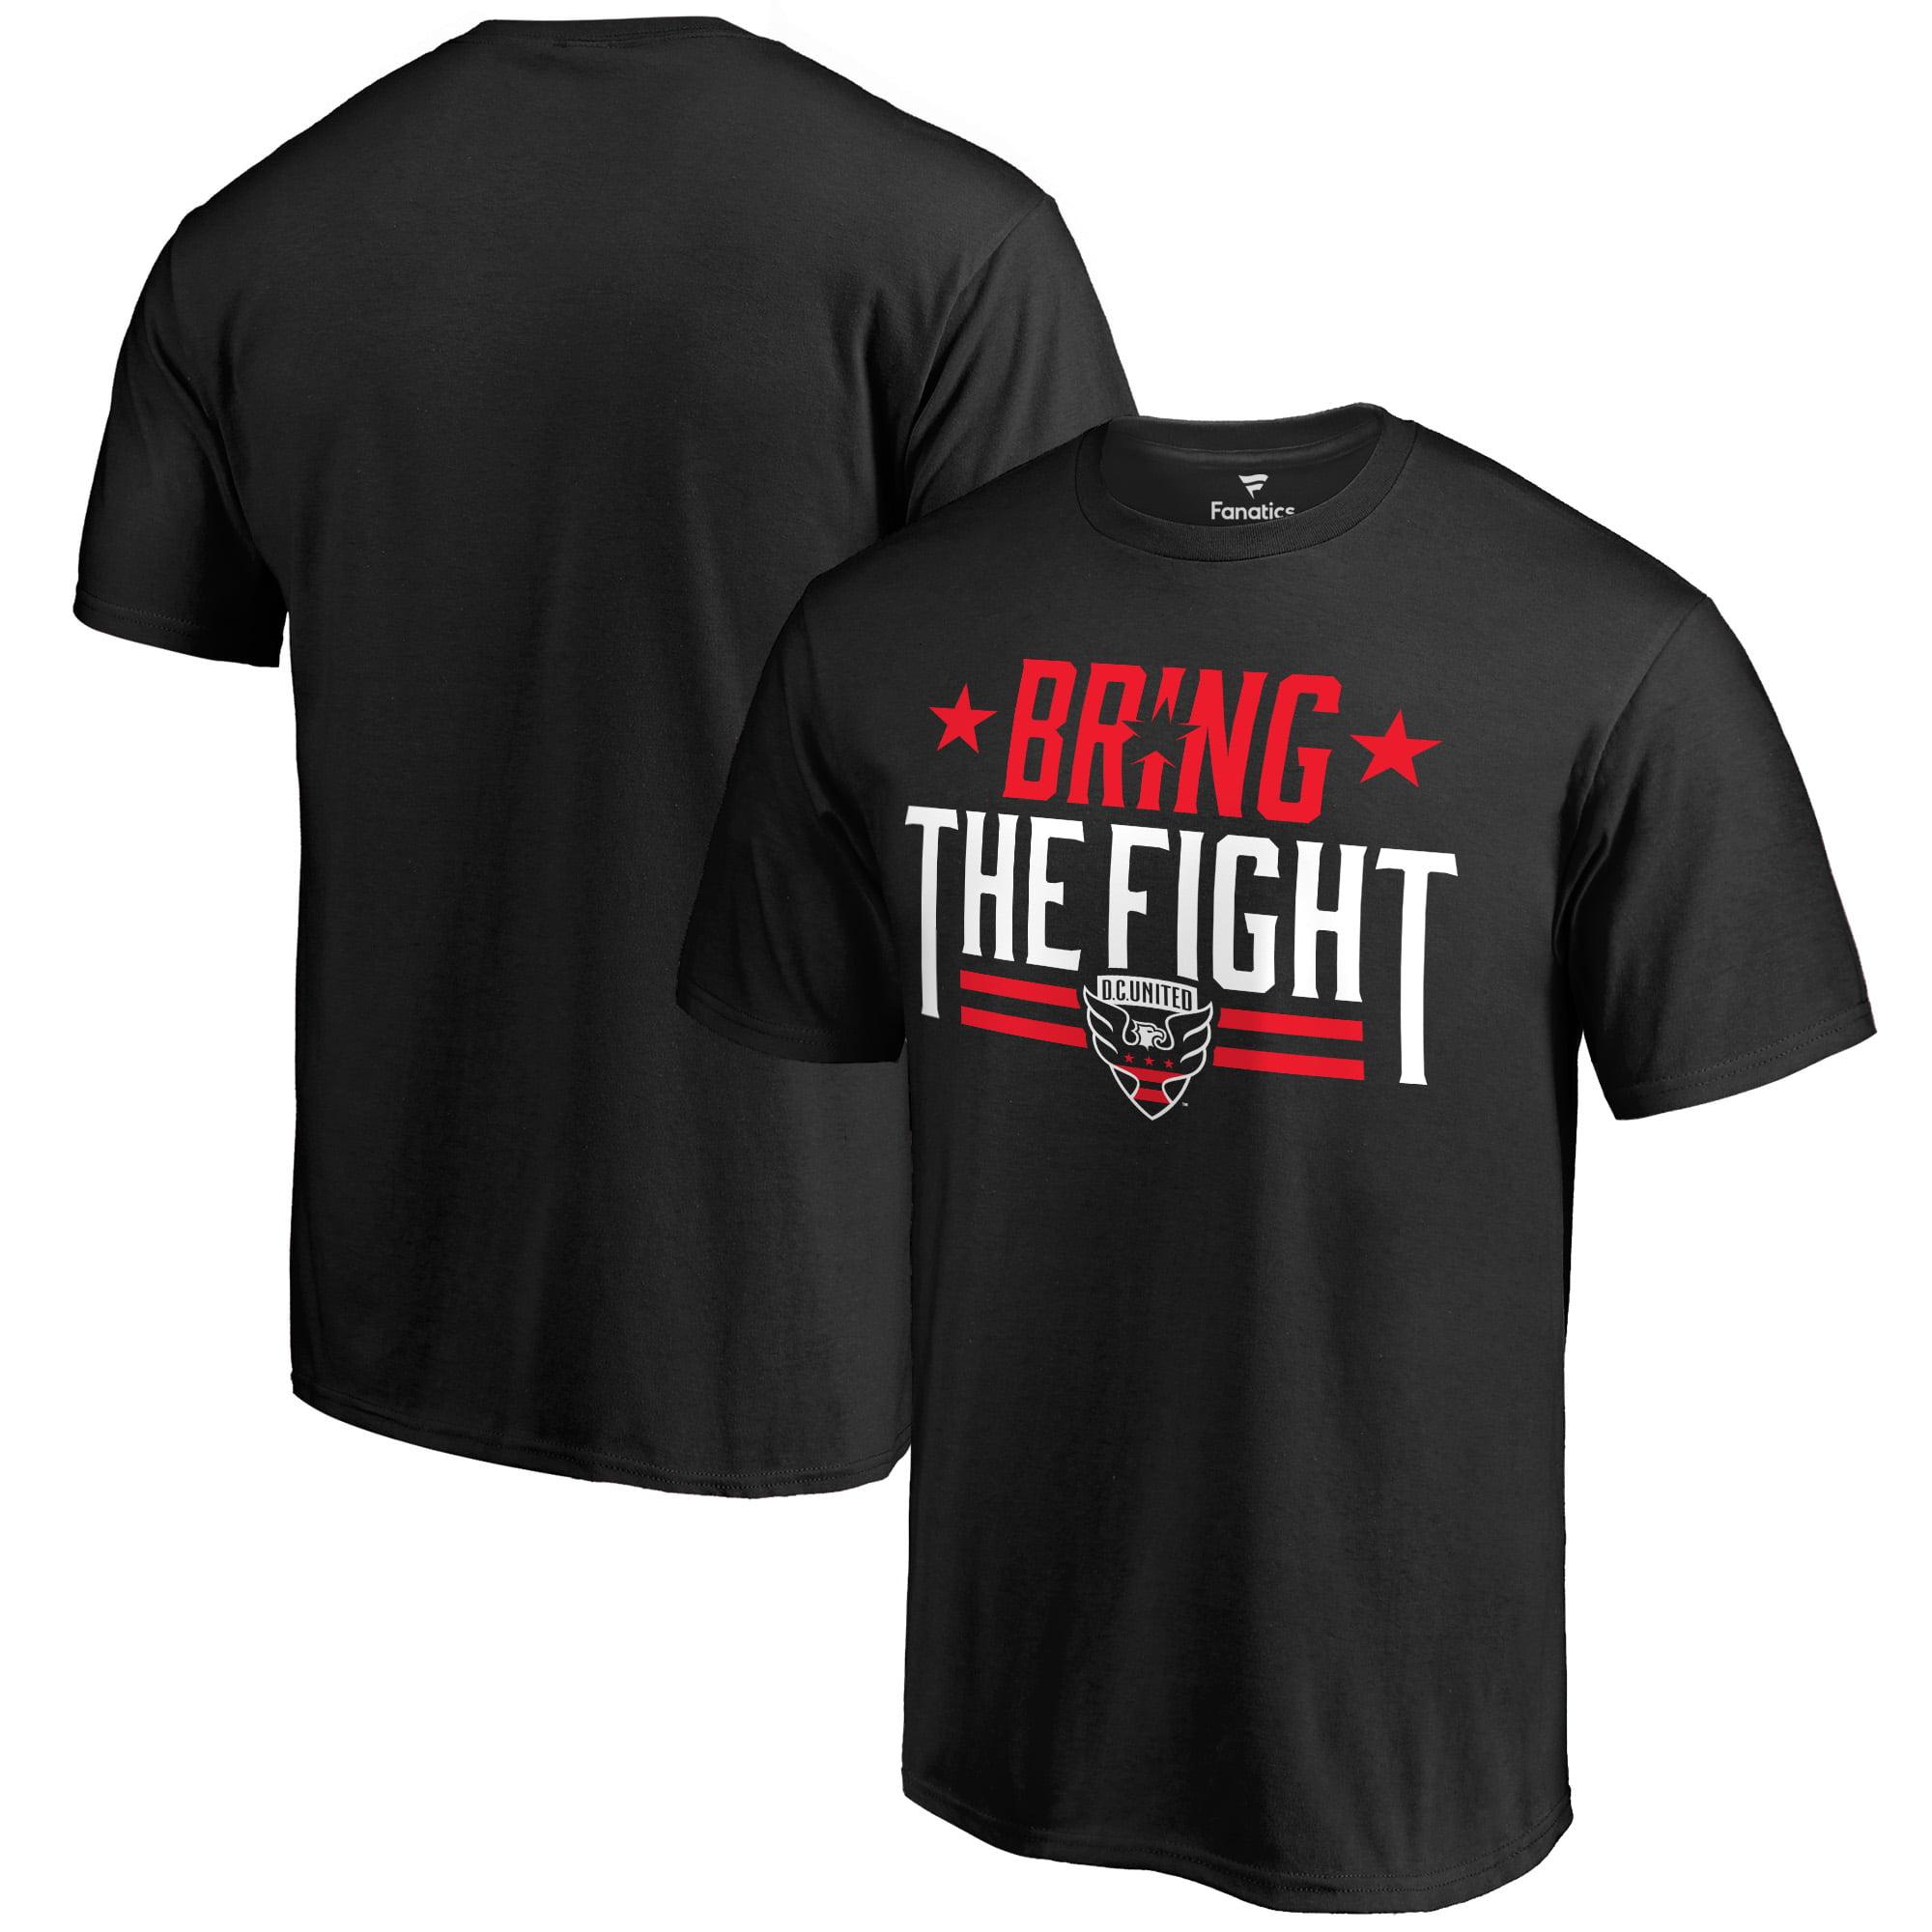 D.C. United Bring The Fight T-Shirt - Black